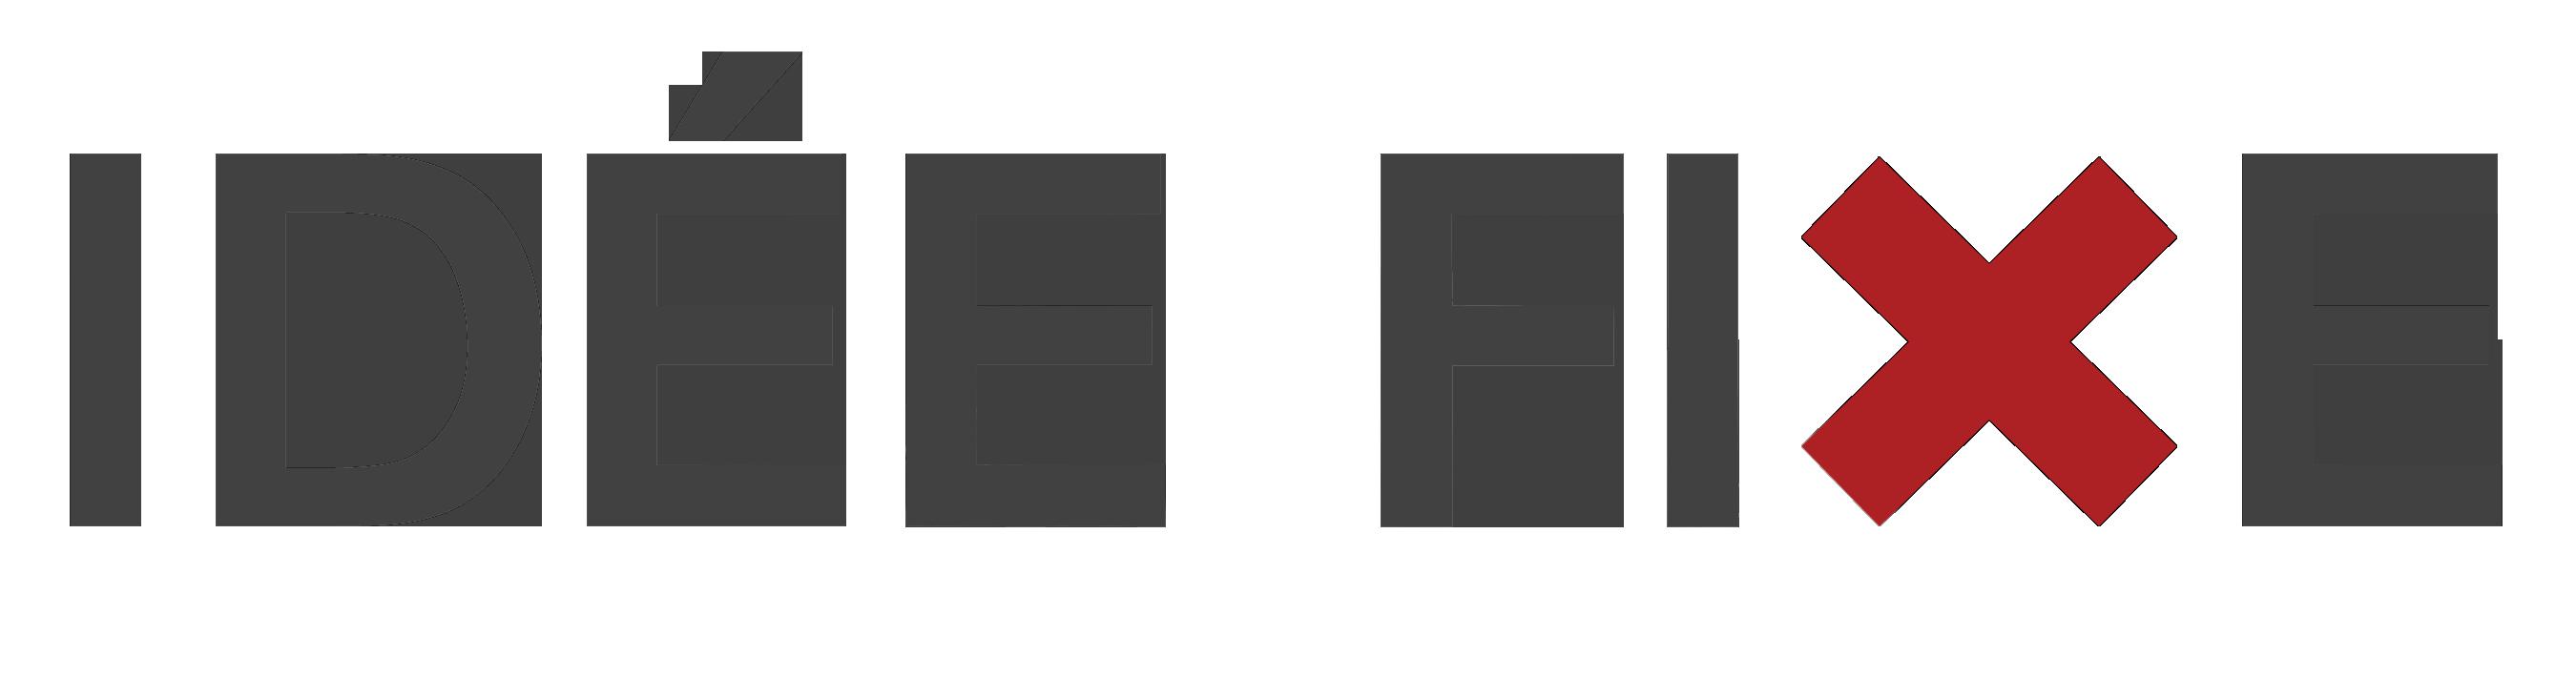 Gut gemocht File:Idee fixe Logo.png - Wikimedia Commons TY85